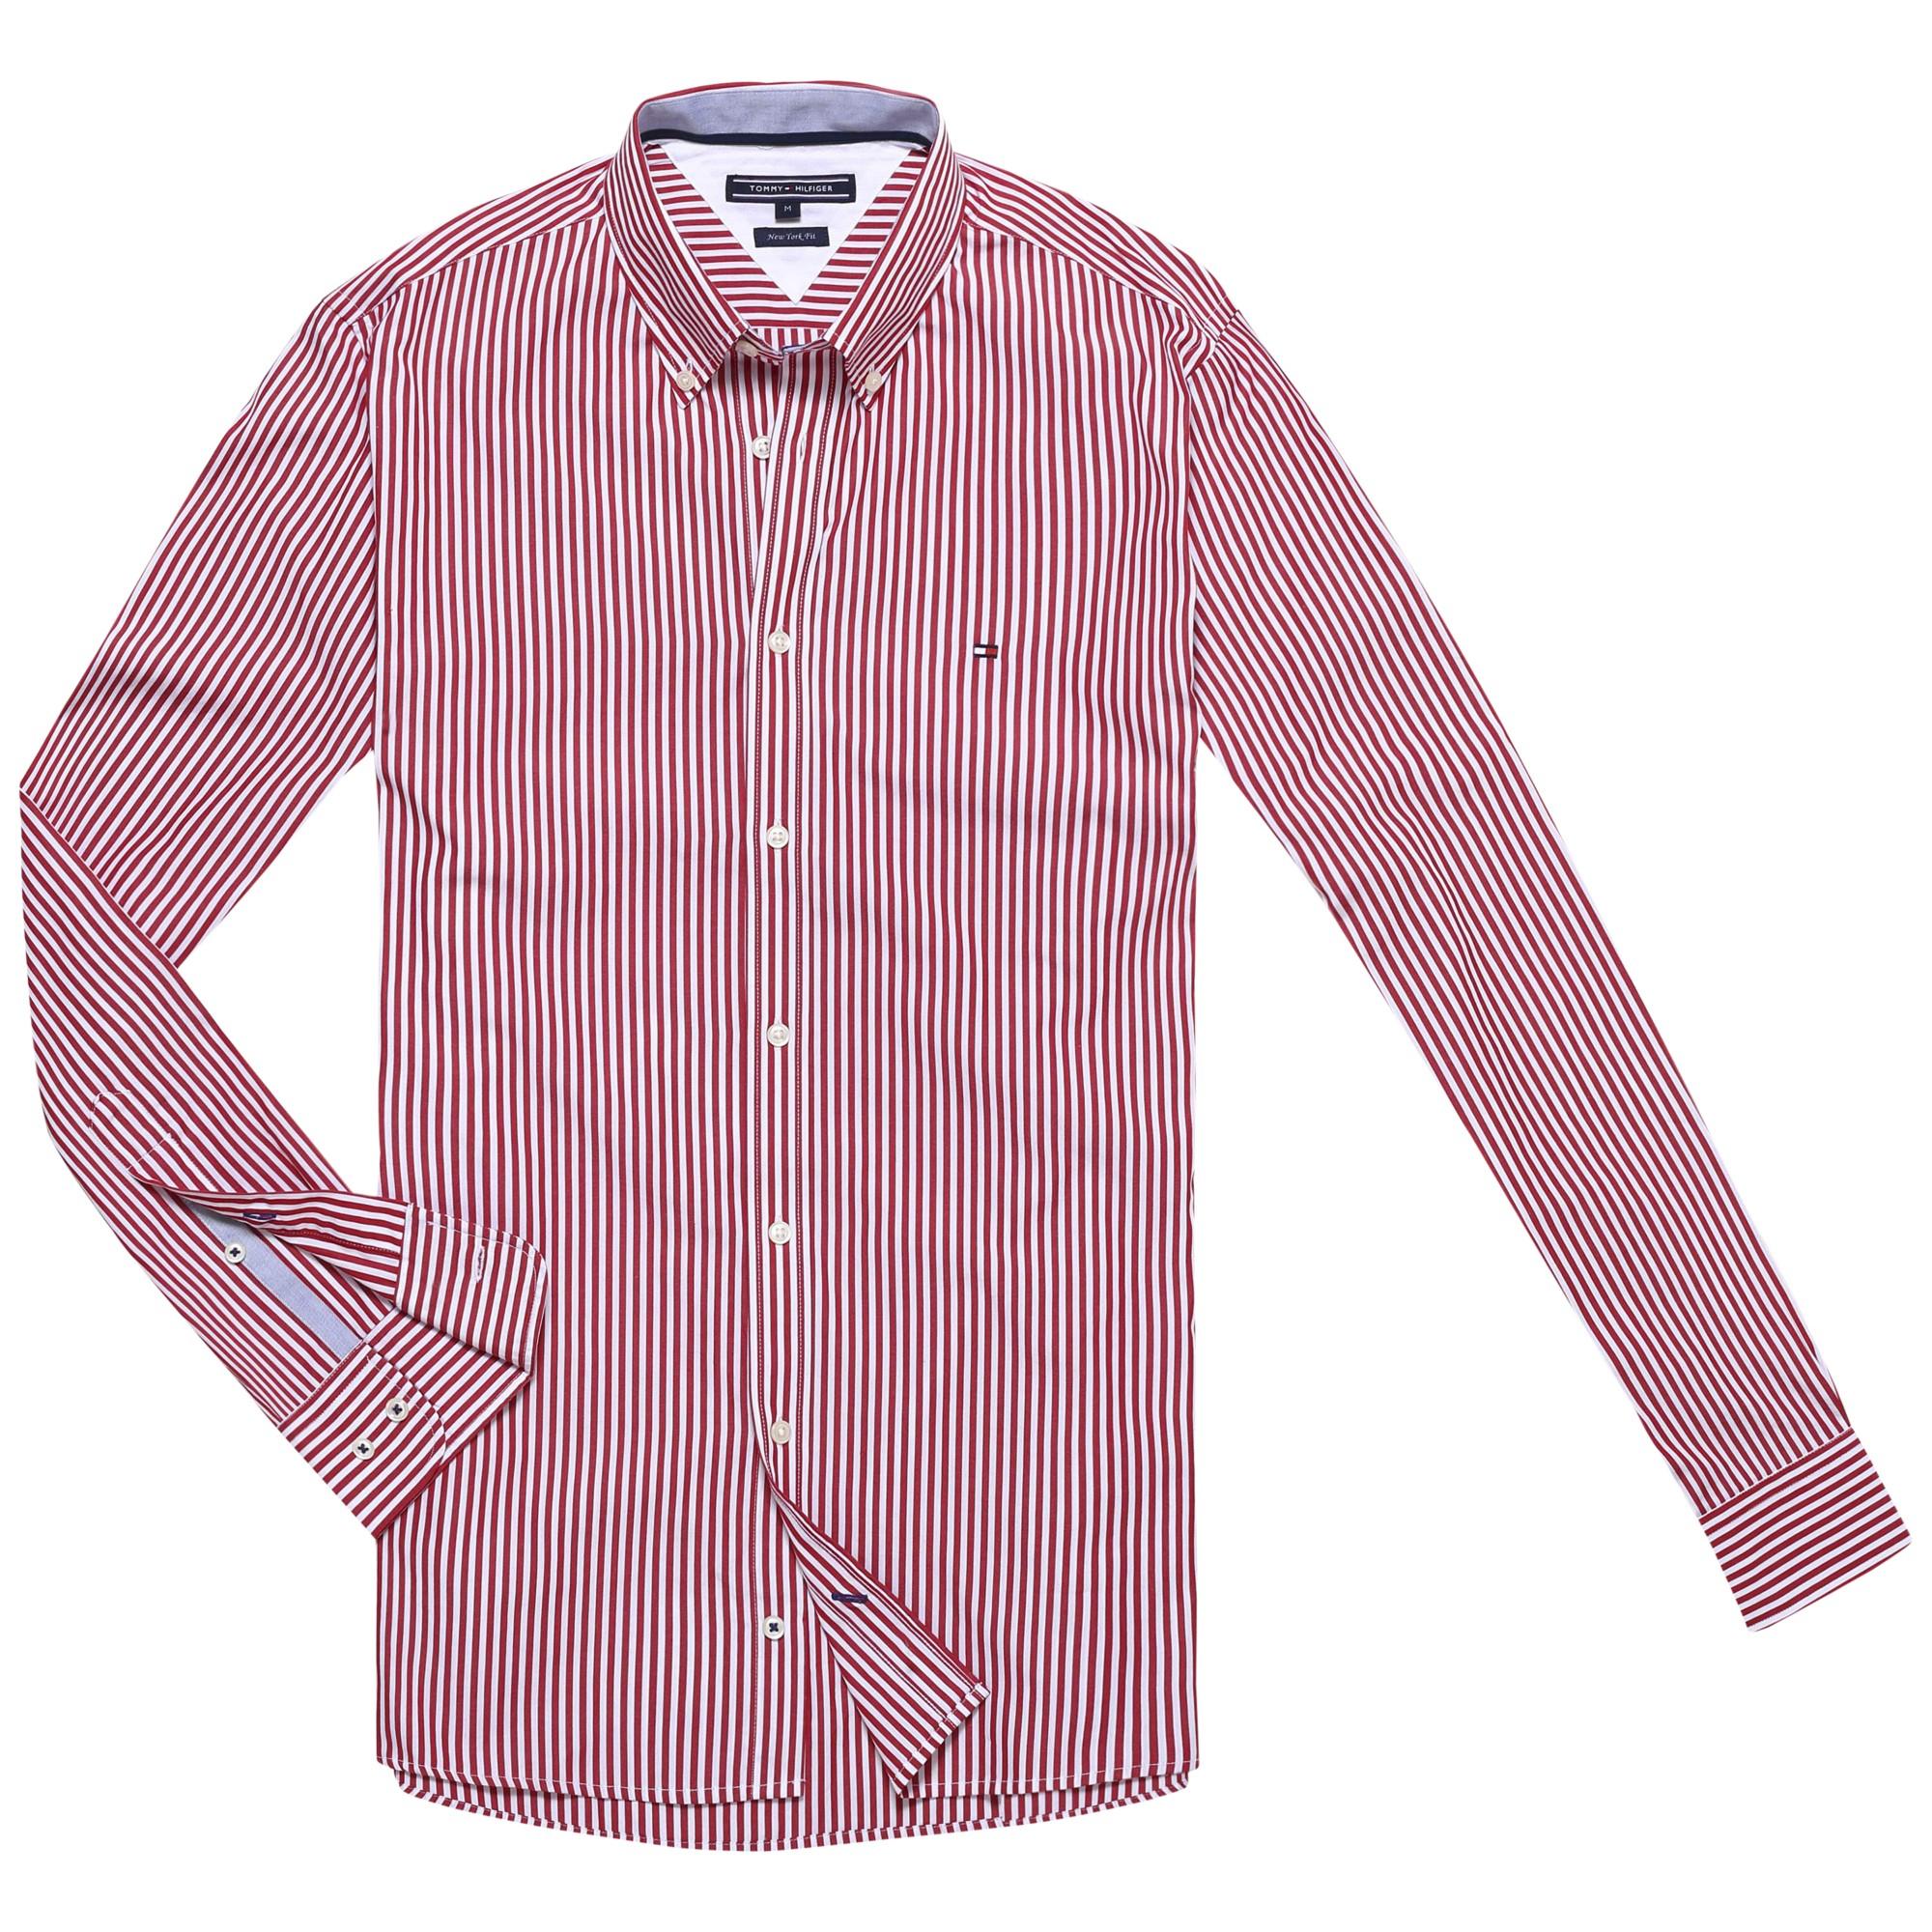 Tommy hilfiger north stripe shirt for men lyst for Tommy hilfiger fitzgerald striped shirt